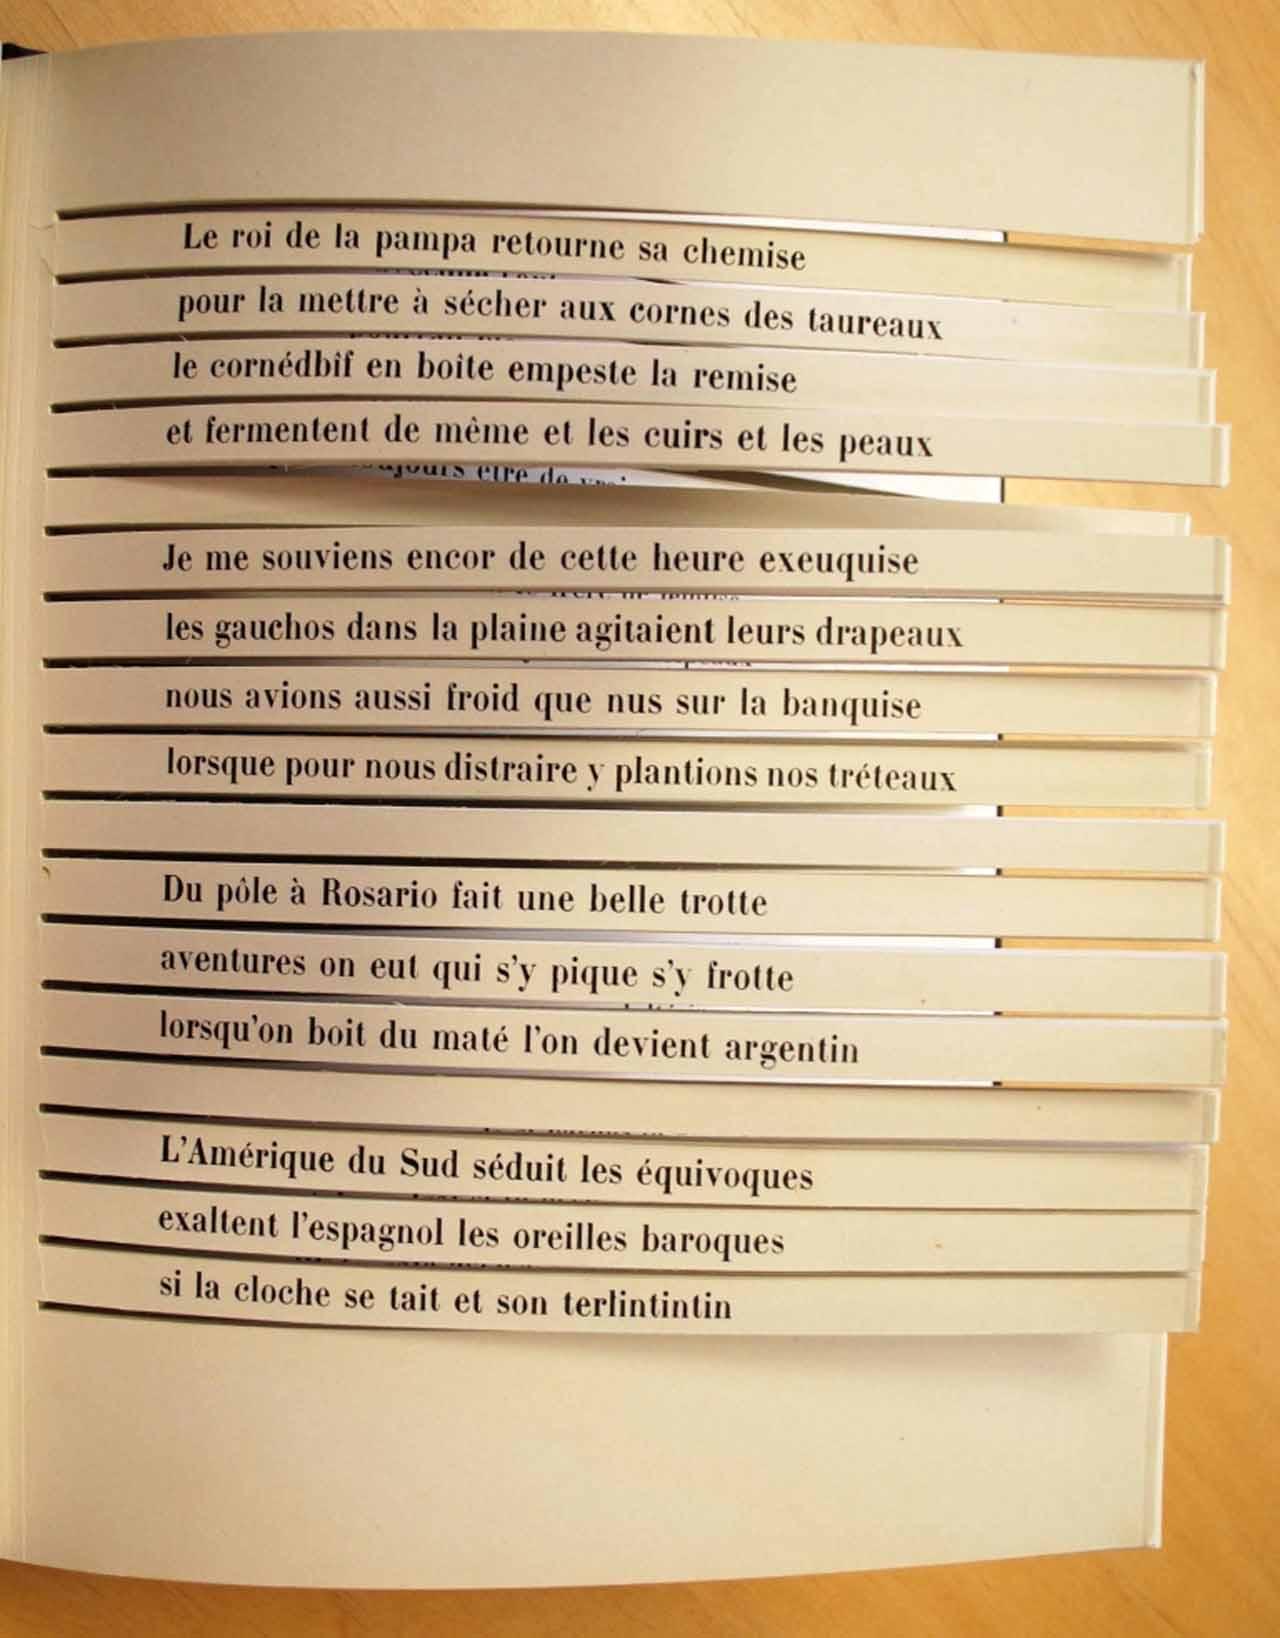 "Raymond Queneau, ""Cent mille milliards de poèmes"" (Paris: Gallimard, 1961) (courtesy of University of Arizona Libraries, Special Collections)"